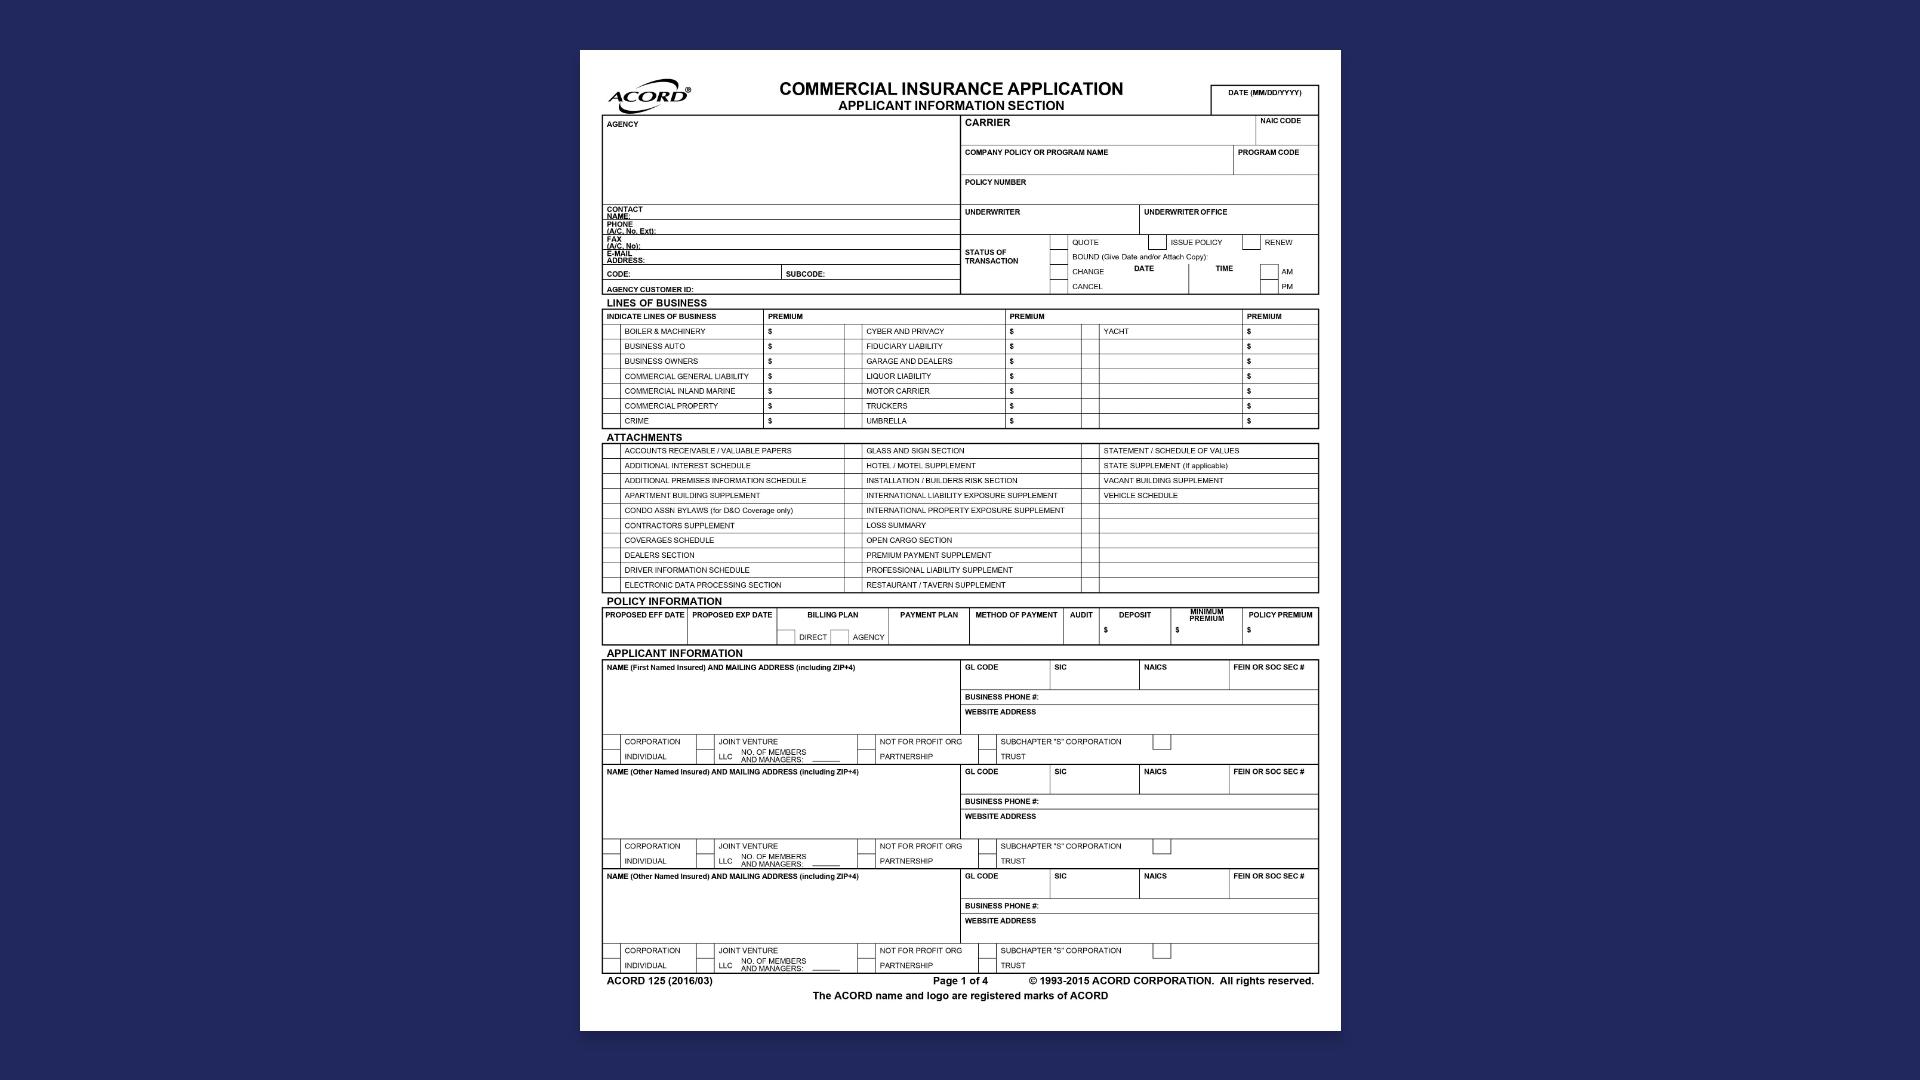 Acord 125 sample